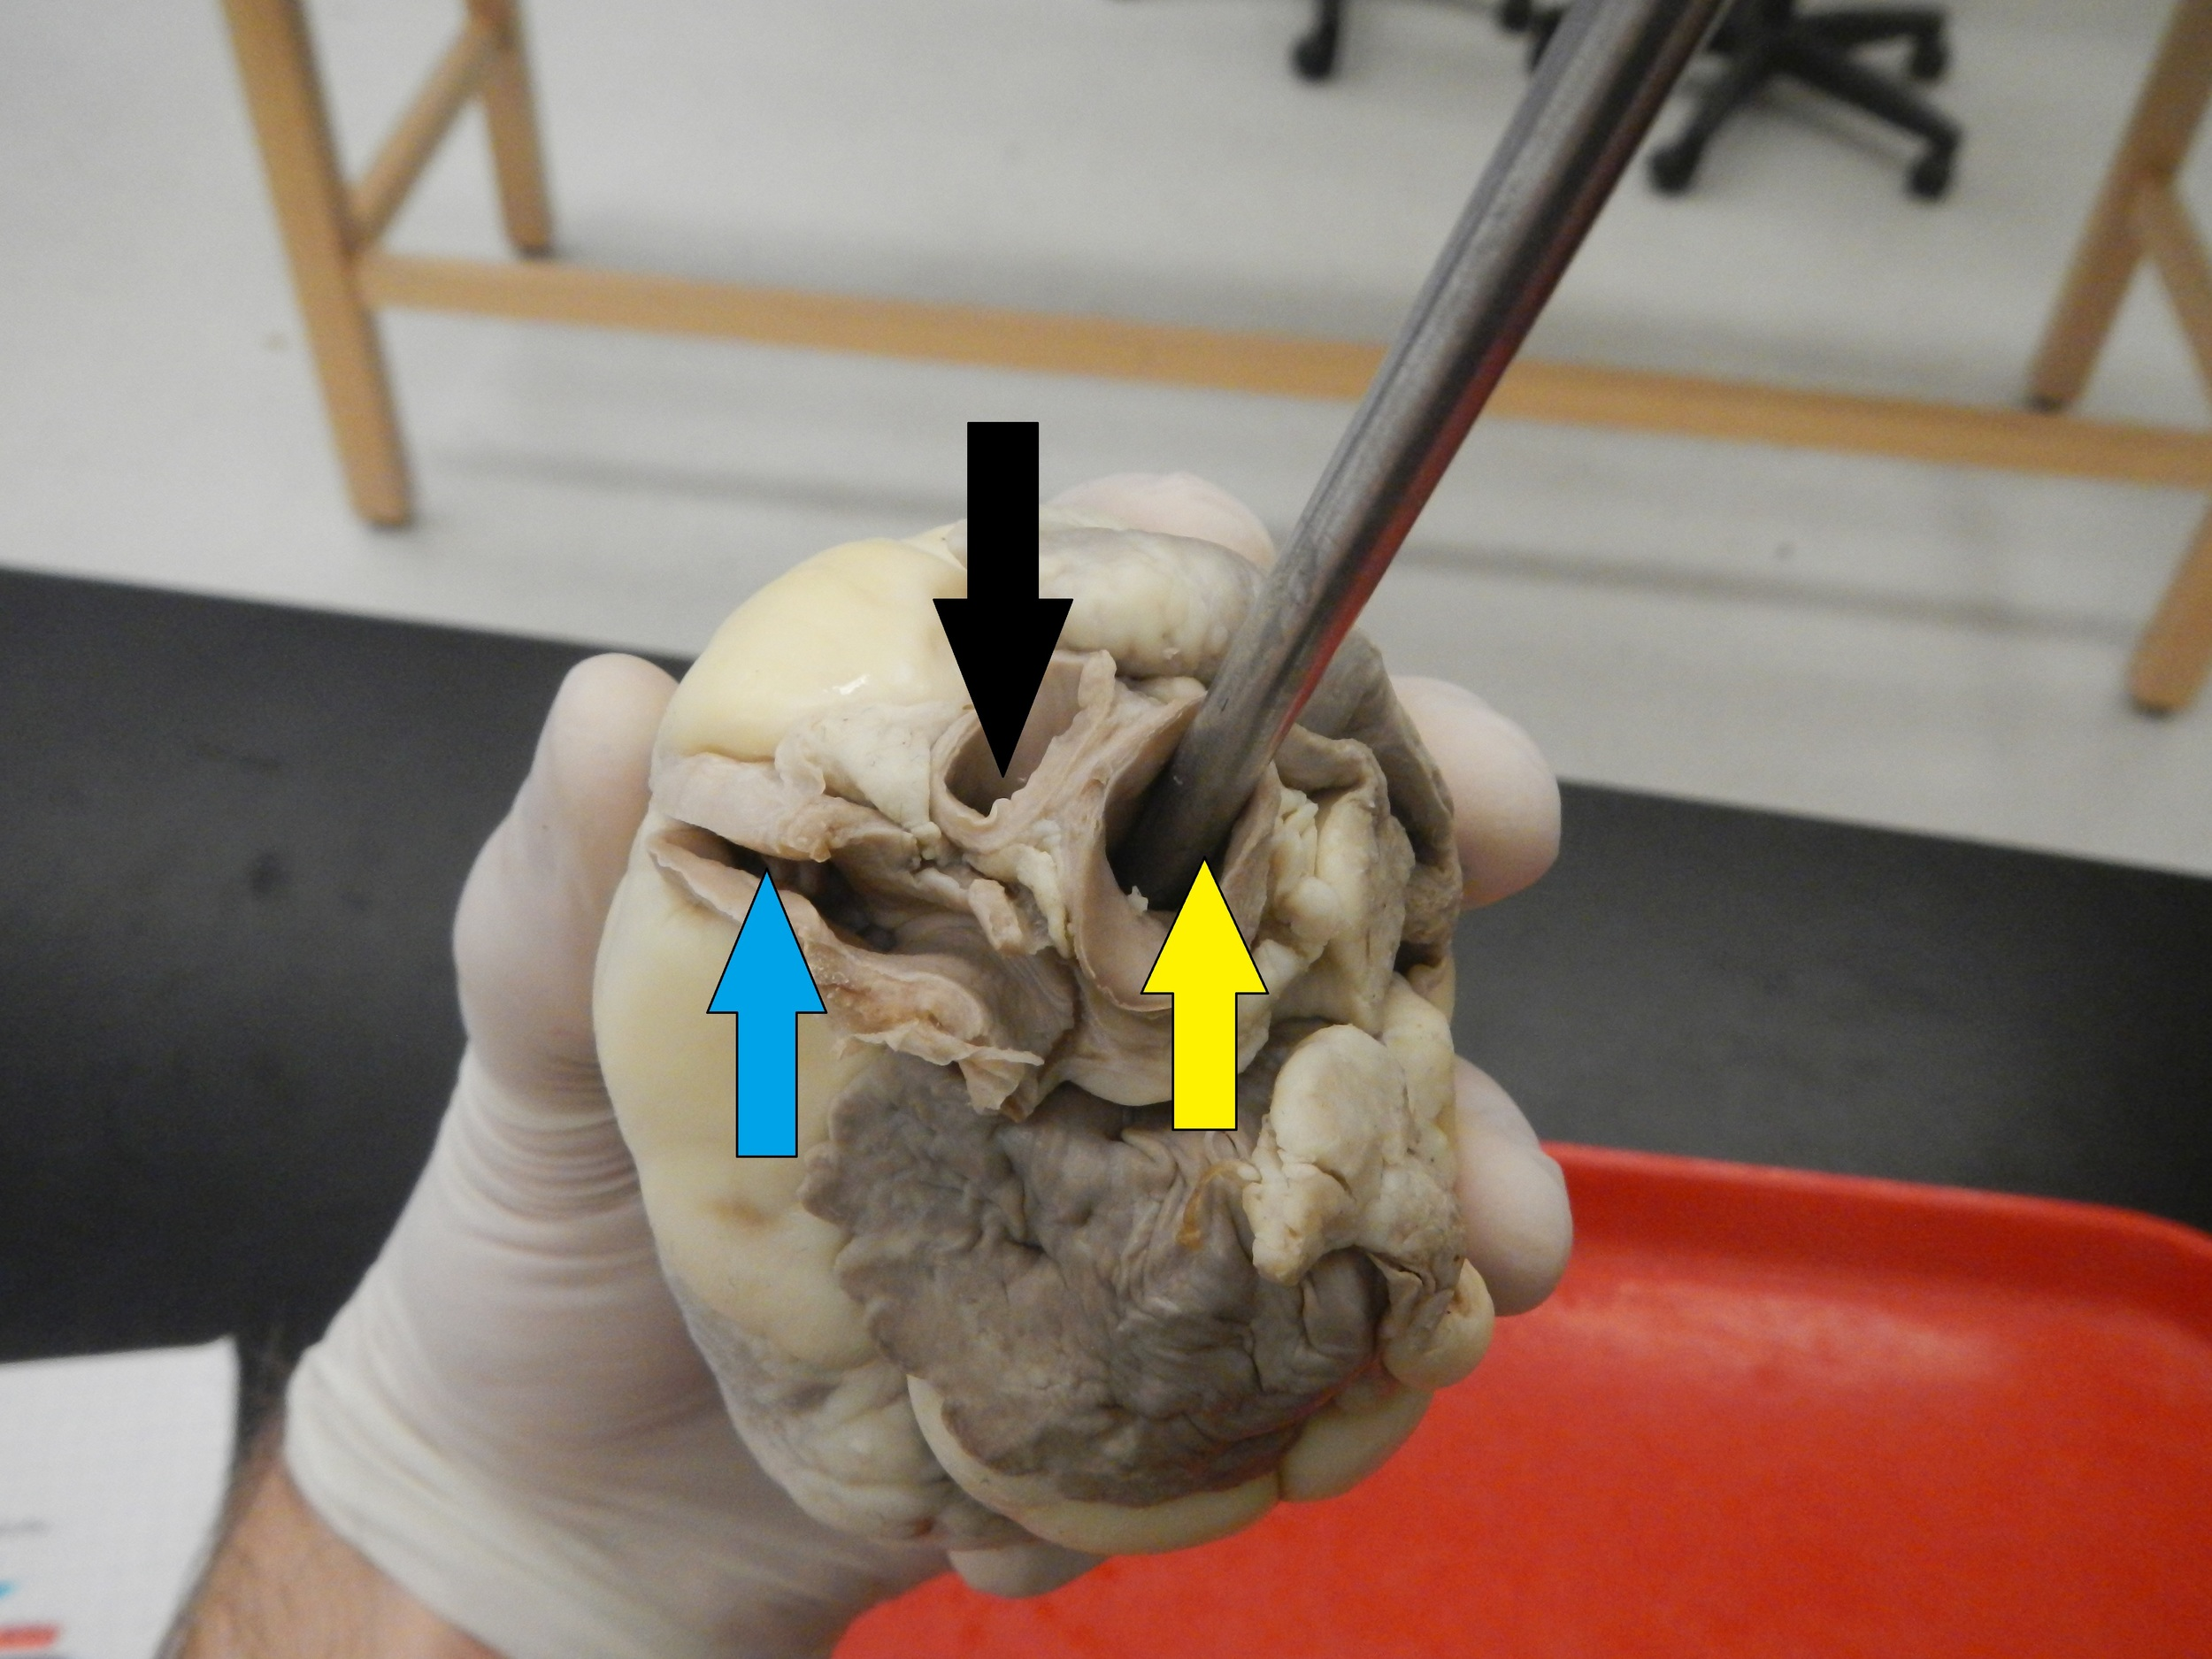 Blue - Pulmonary Artery  Yellow - Aorta  Black - Brachiocephalic Artery (Will not be tested on)